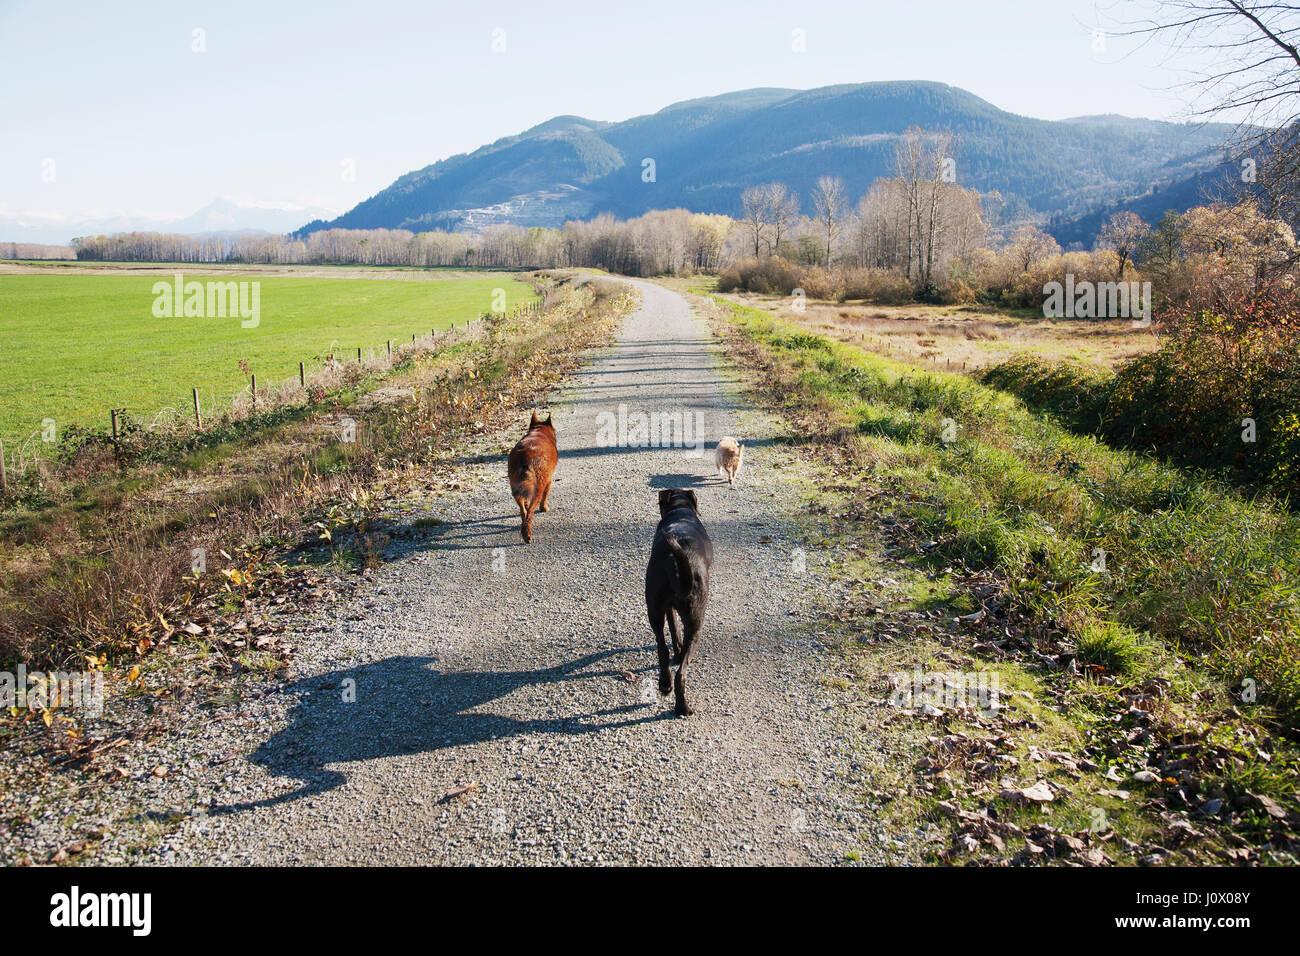 Three dogs walking along dike by the Fraser River Property Released PR_Pumpkin1.pdf PR_Xaviar1.pdf PR_Abby1.pdf - Stock Image